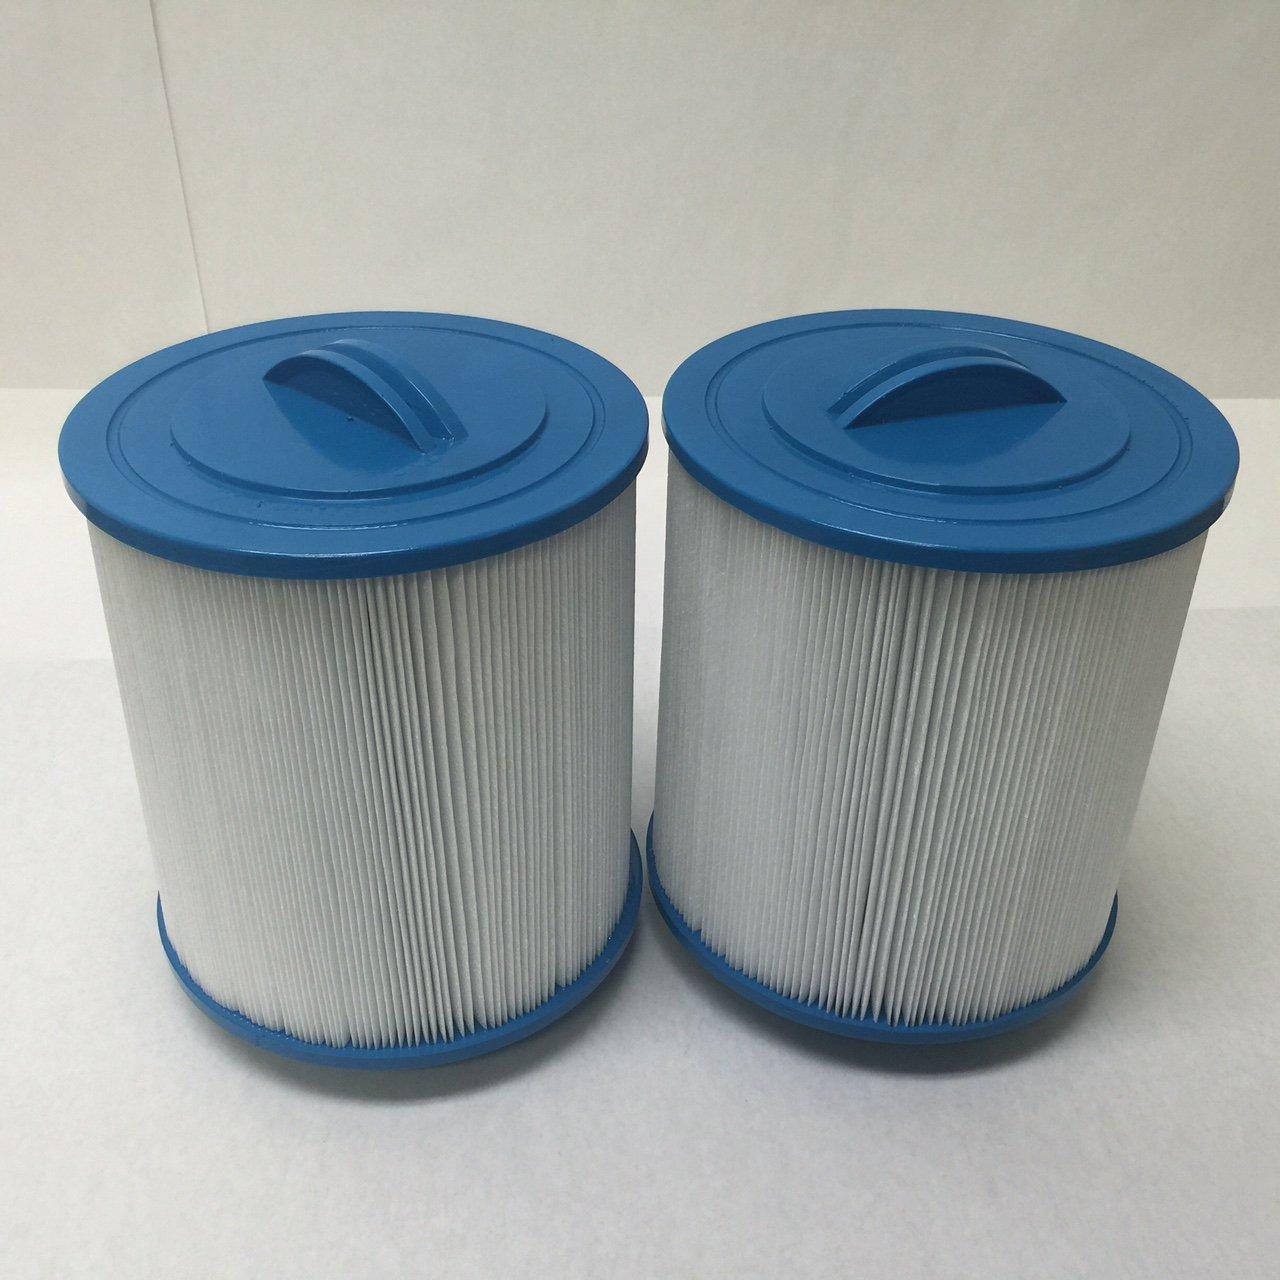 2 PACK GAURDIAN POOL/SPA Filter fits: Pleatco:PAS50SV-F2M, Unicel: 6CH-502, Filbur: FC-031 Artesian spas, MAJESTIC